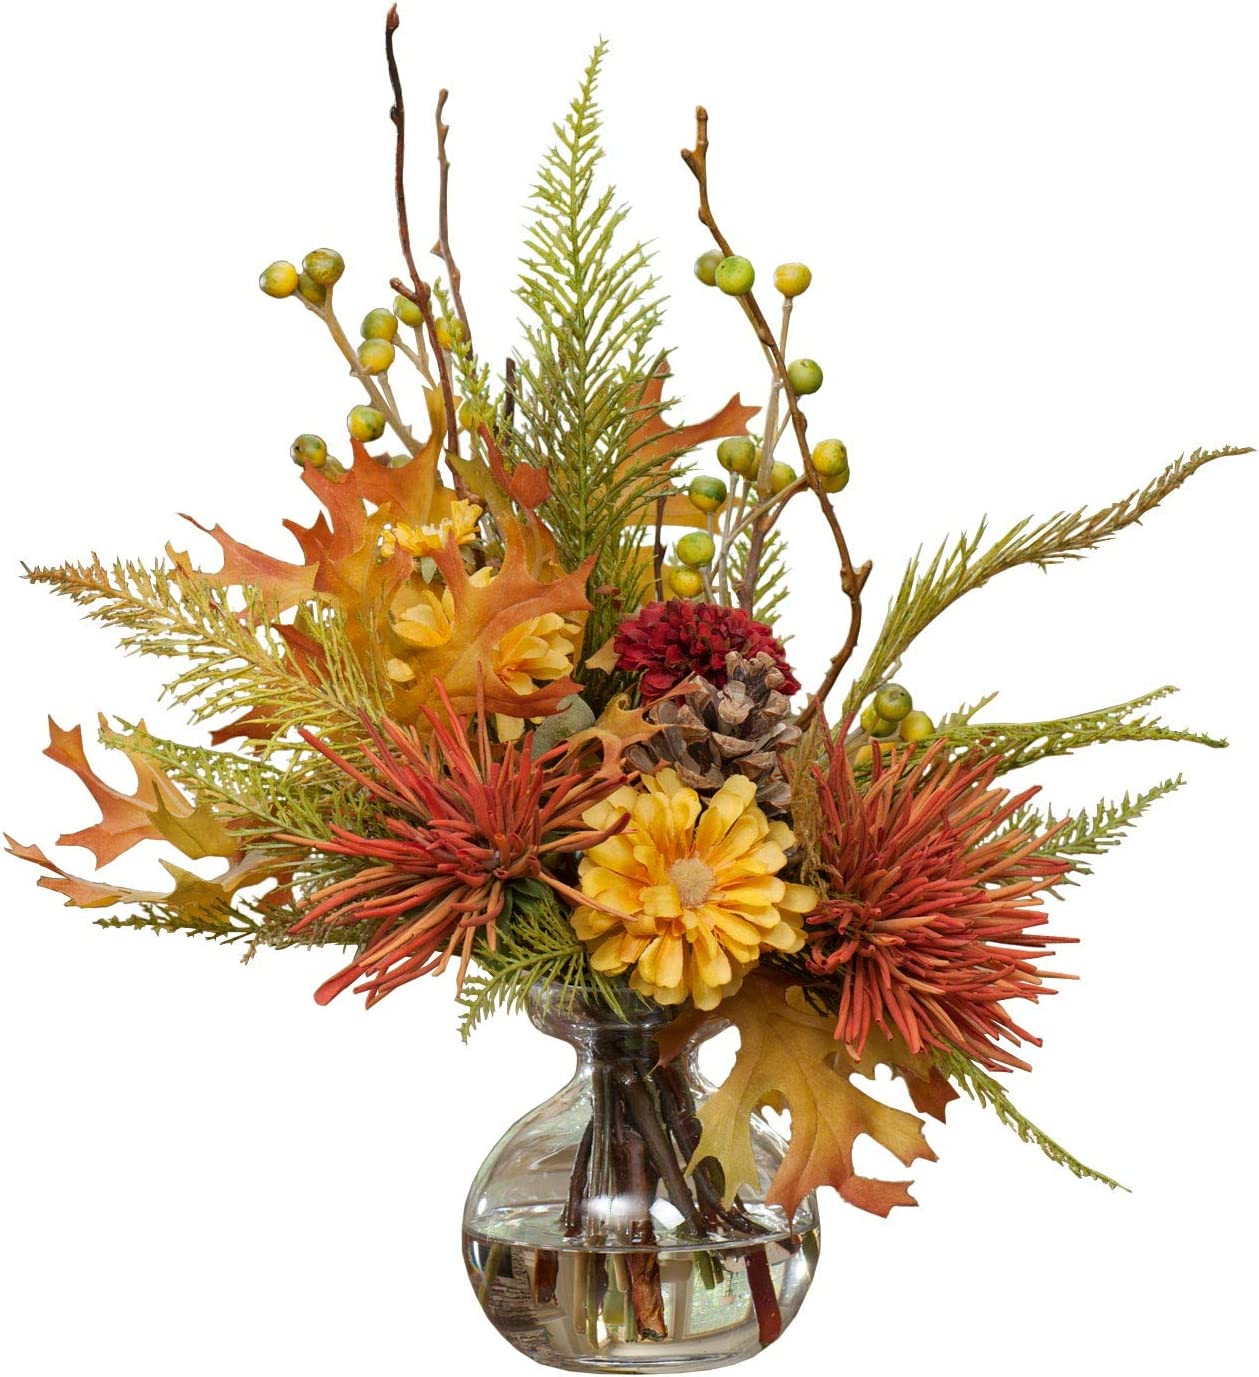 Amazon Com Petals Harvest Moon Silk Flower Arrangement Handcrafted Amazingly Lifelike 13 X 12 Inches Furniture Decor